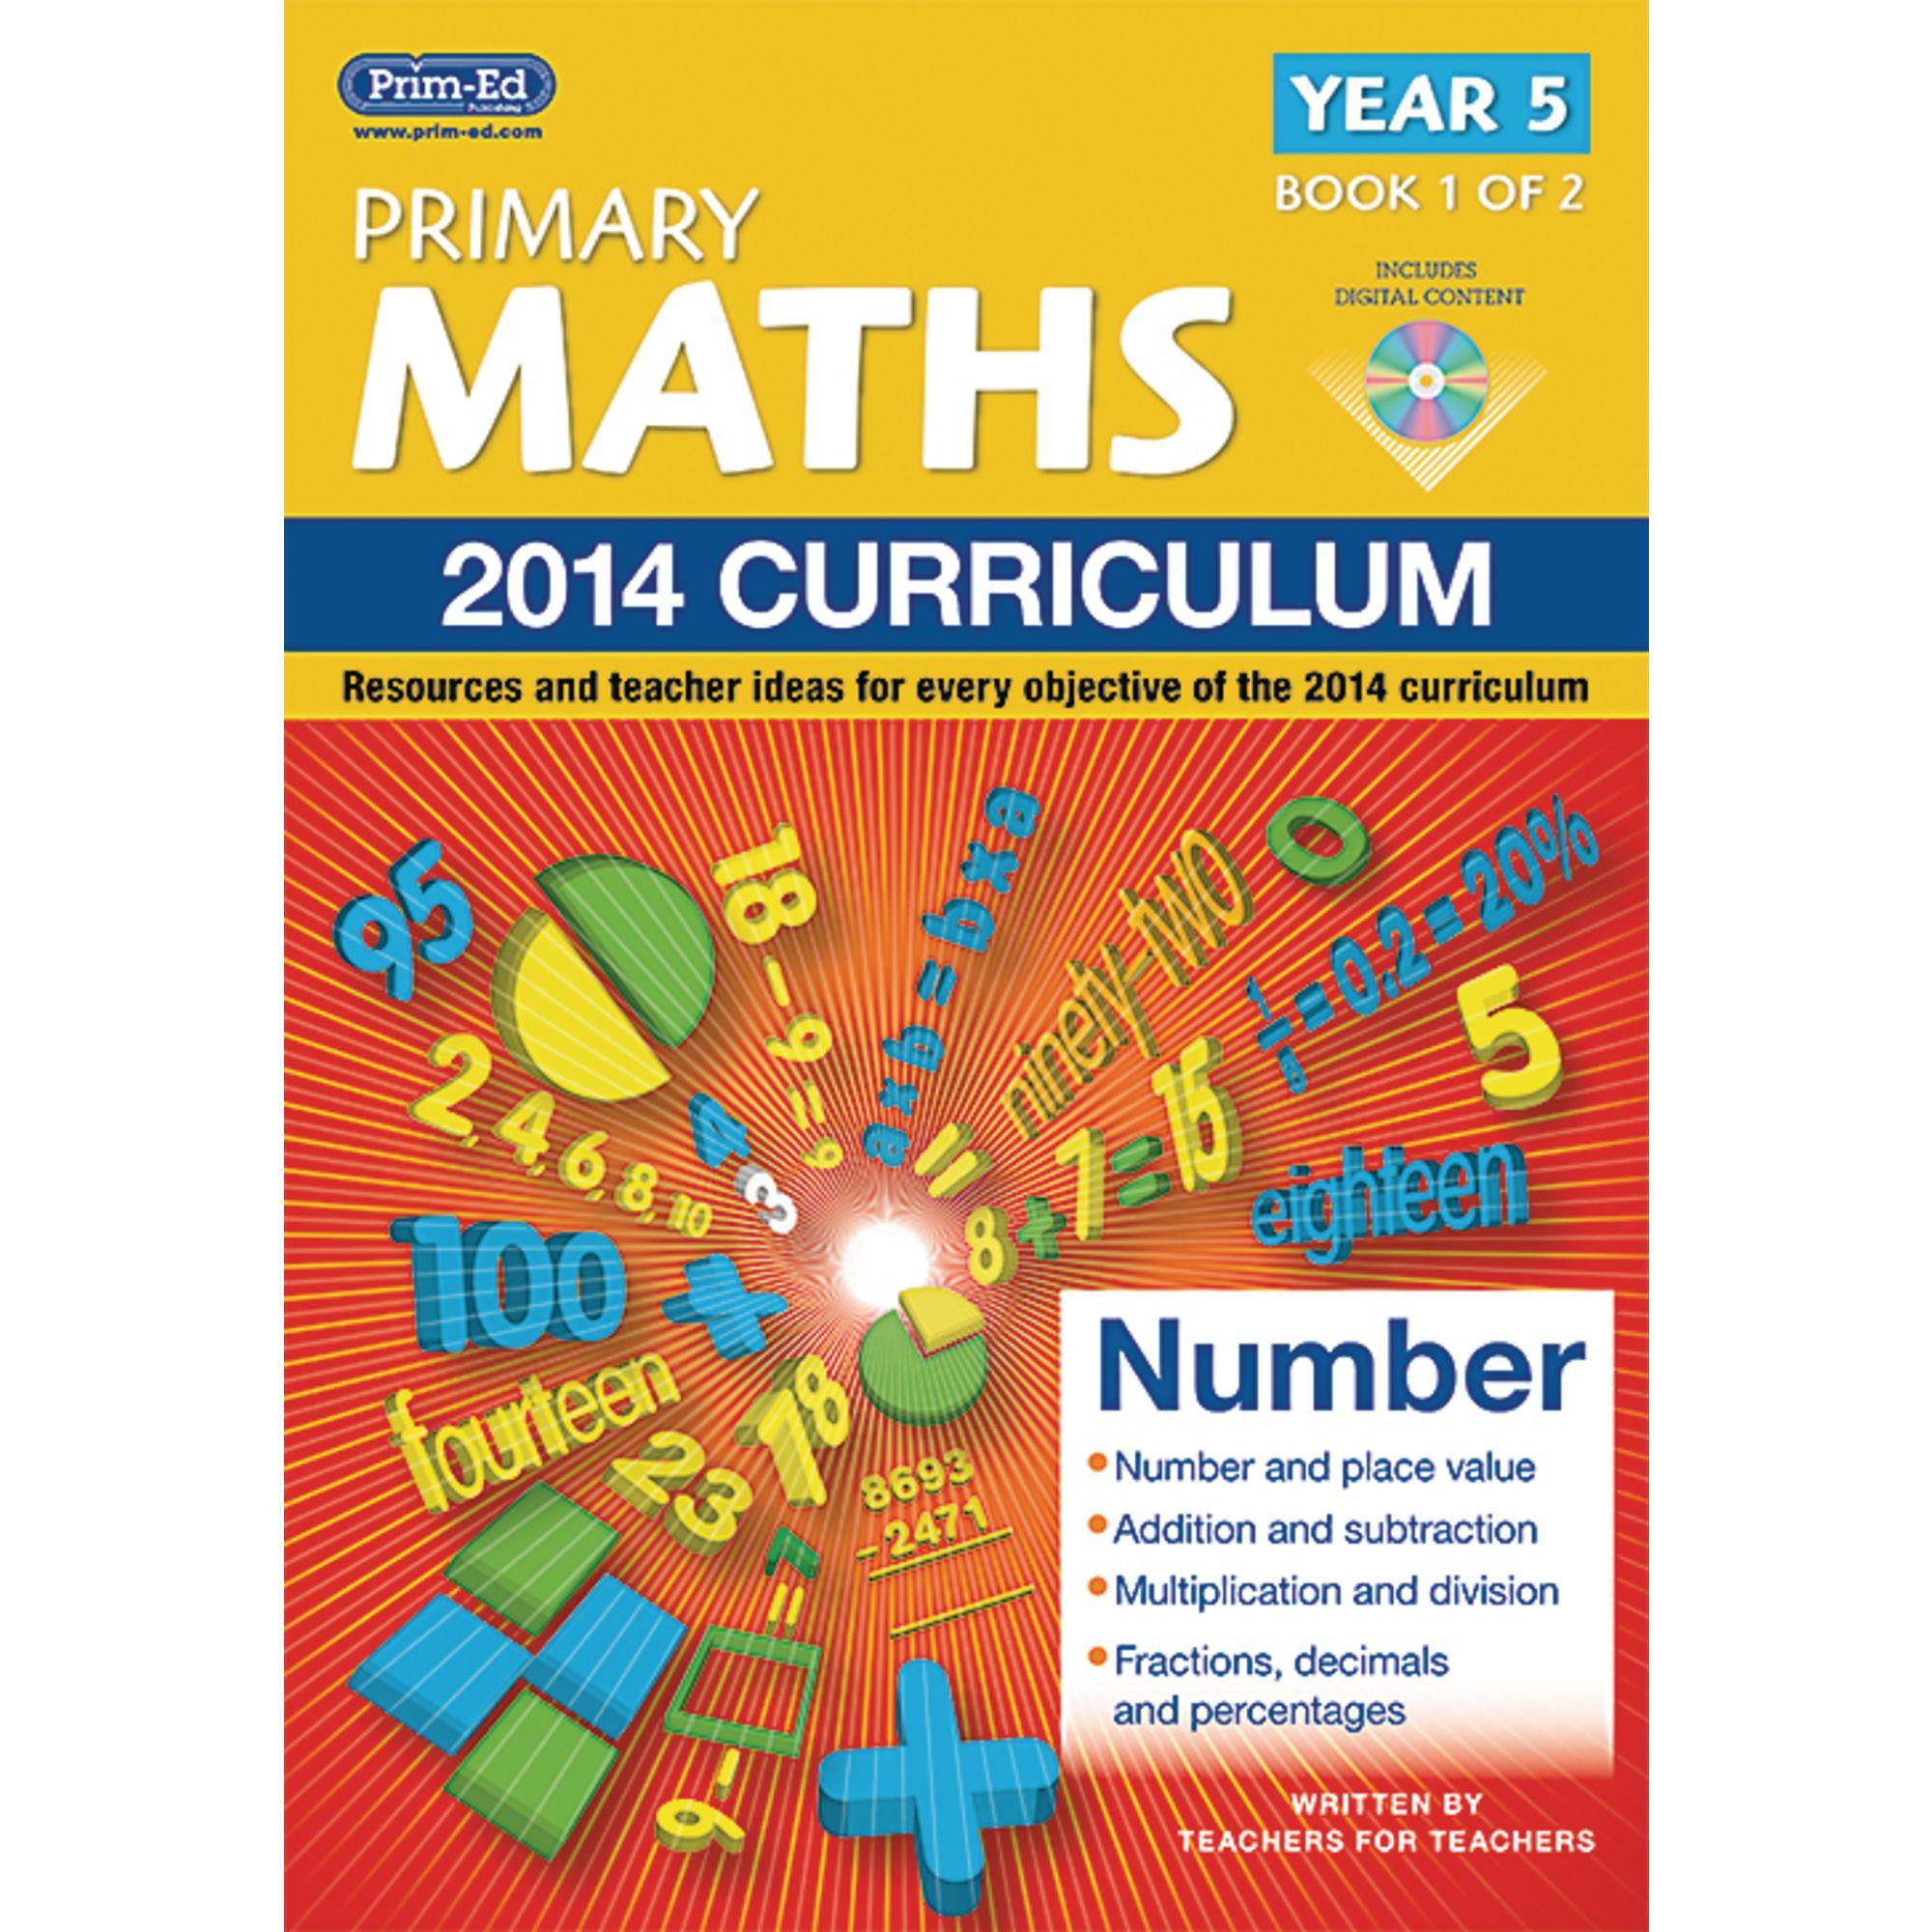 2014 Primary Maths Curriculum Book Year 5 - Book 1